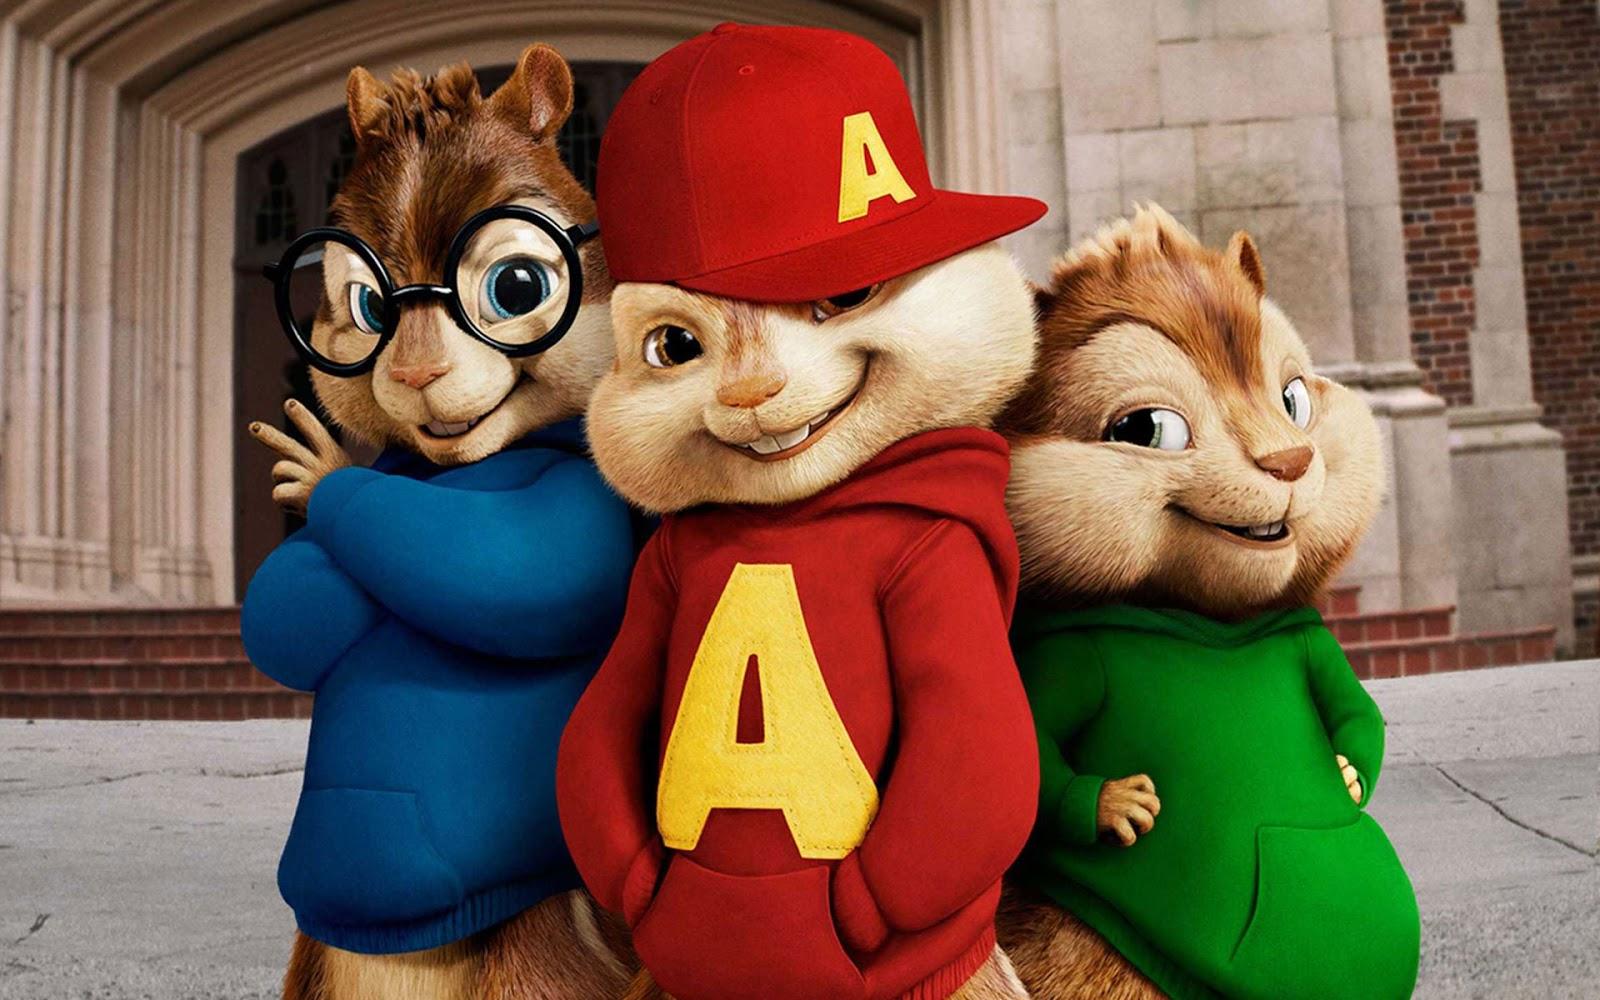 Alvin and the Chipmunks 4 Movie : Teaser Trailer